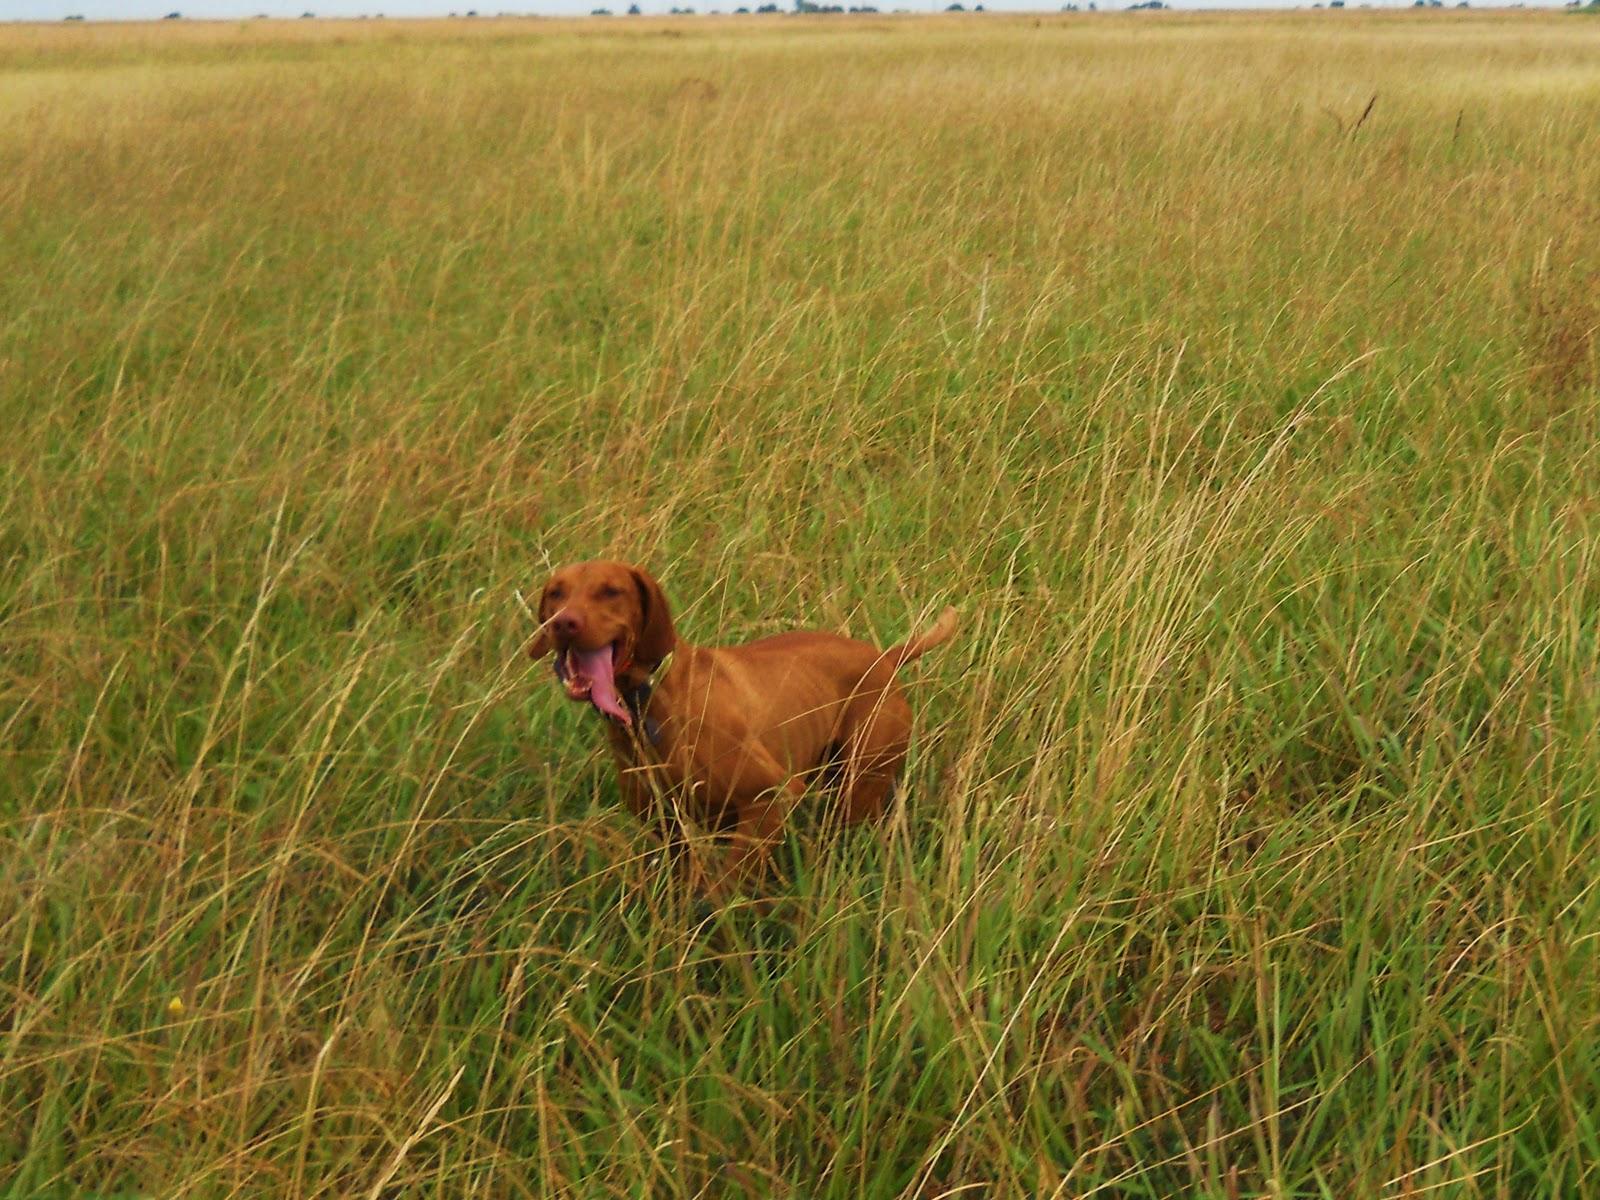 redbirddog - a hungarian pointer (vizsla) blog: First ...